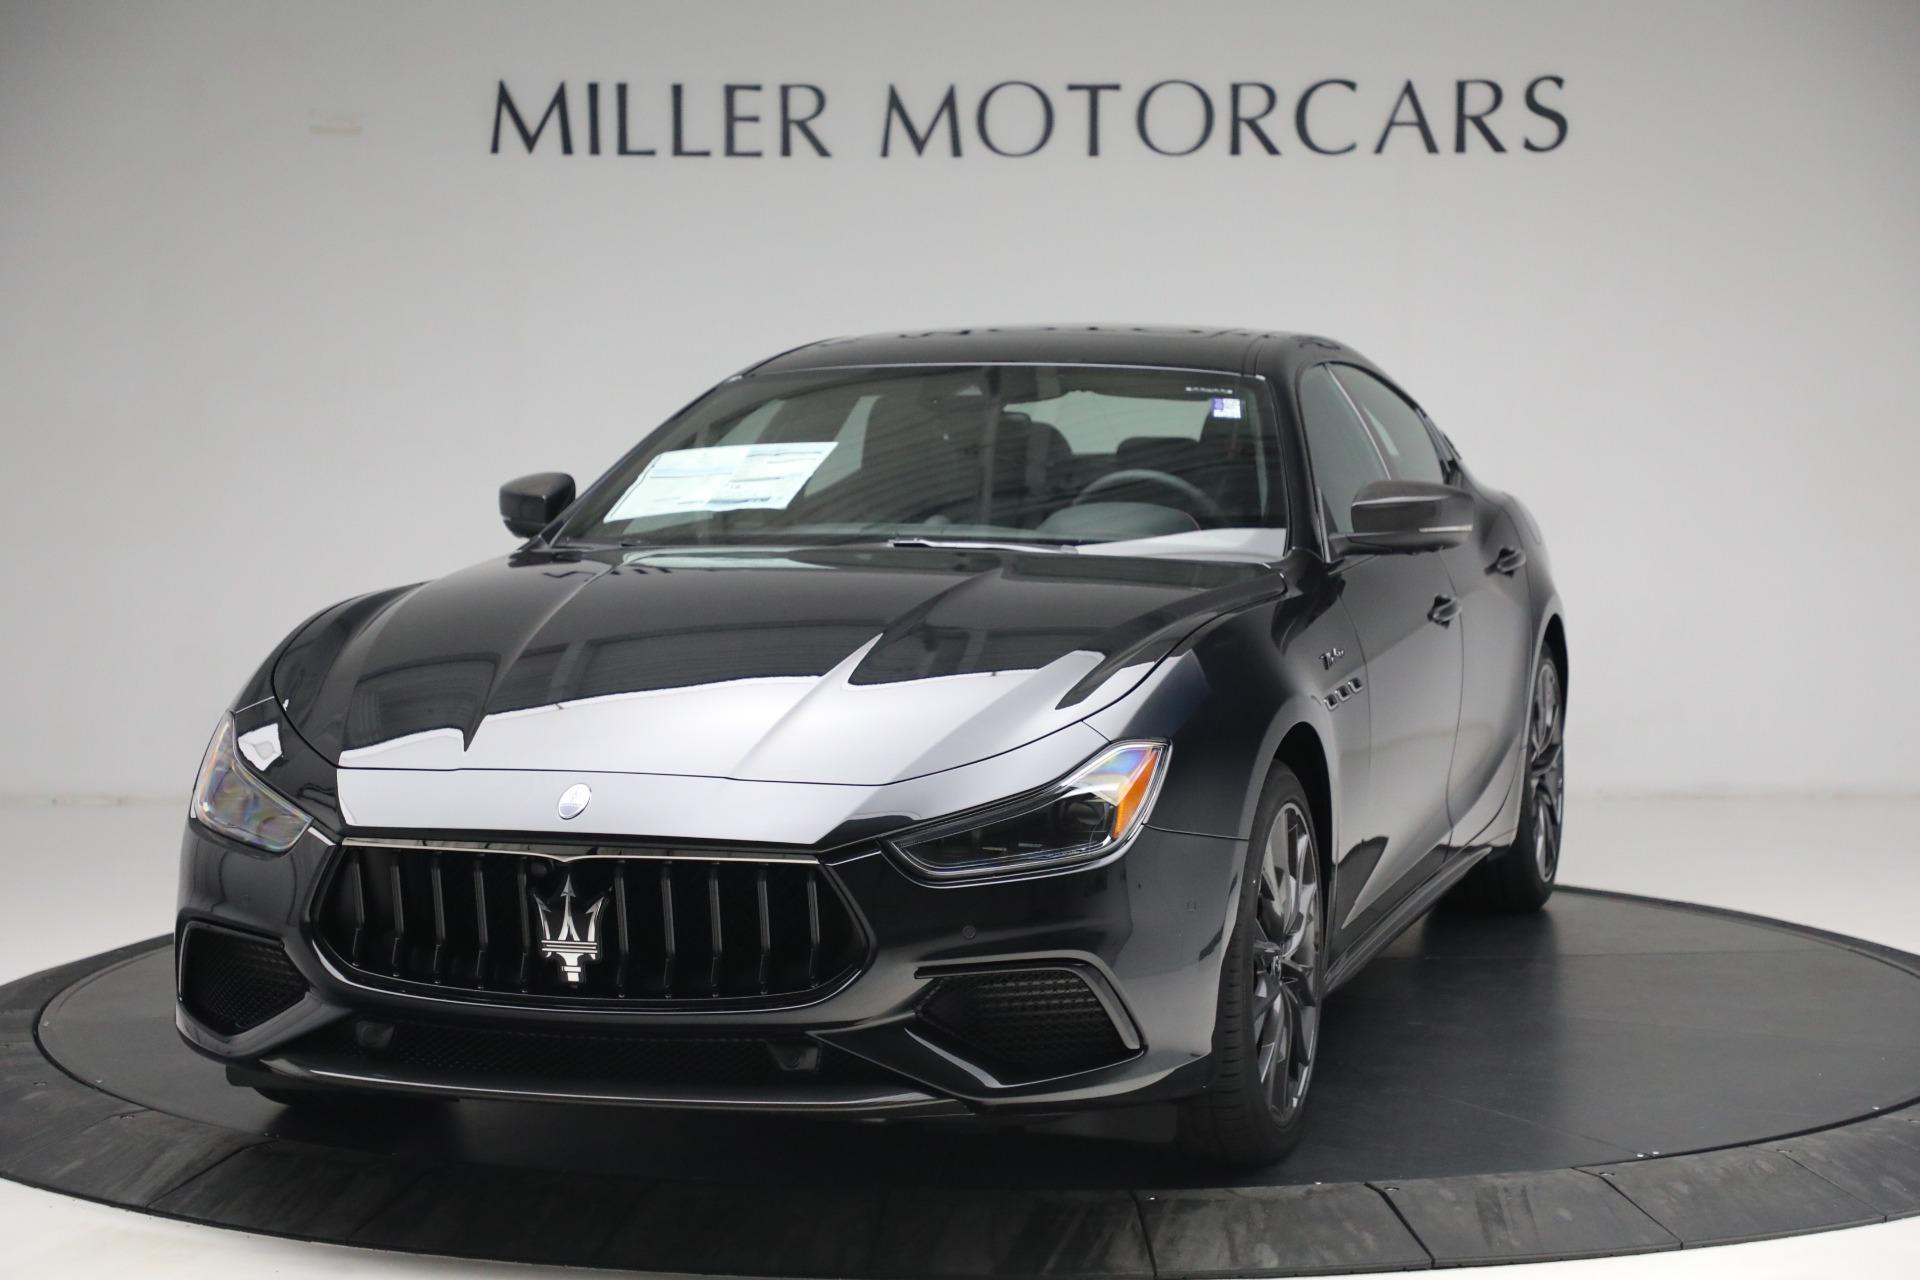 New 2022 Maserati Ghibli Modena Q4 for sale $103,855 at Pagani of Greenwich in Greenwich CT 06830 1